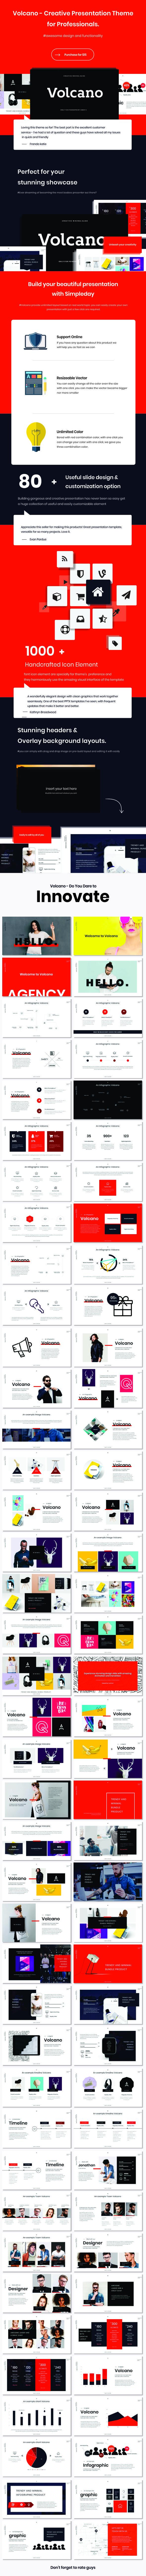 volcano powerpoint templatemikoaldric | graphicriver, Modern powerpoint